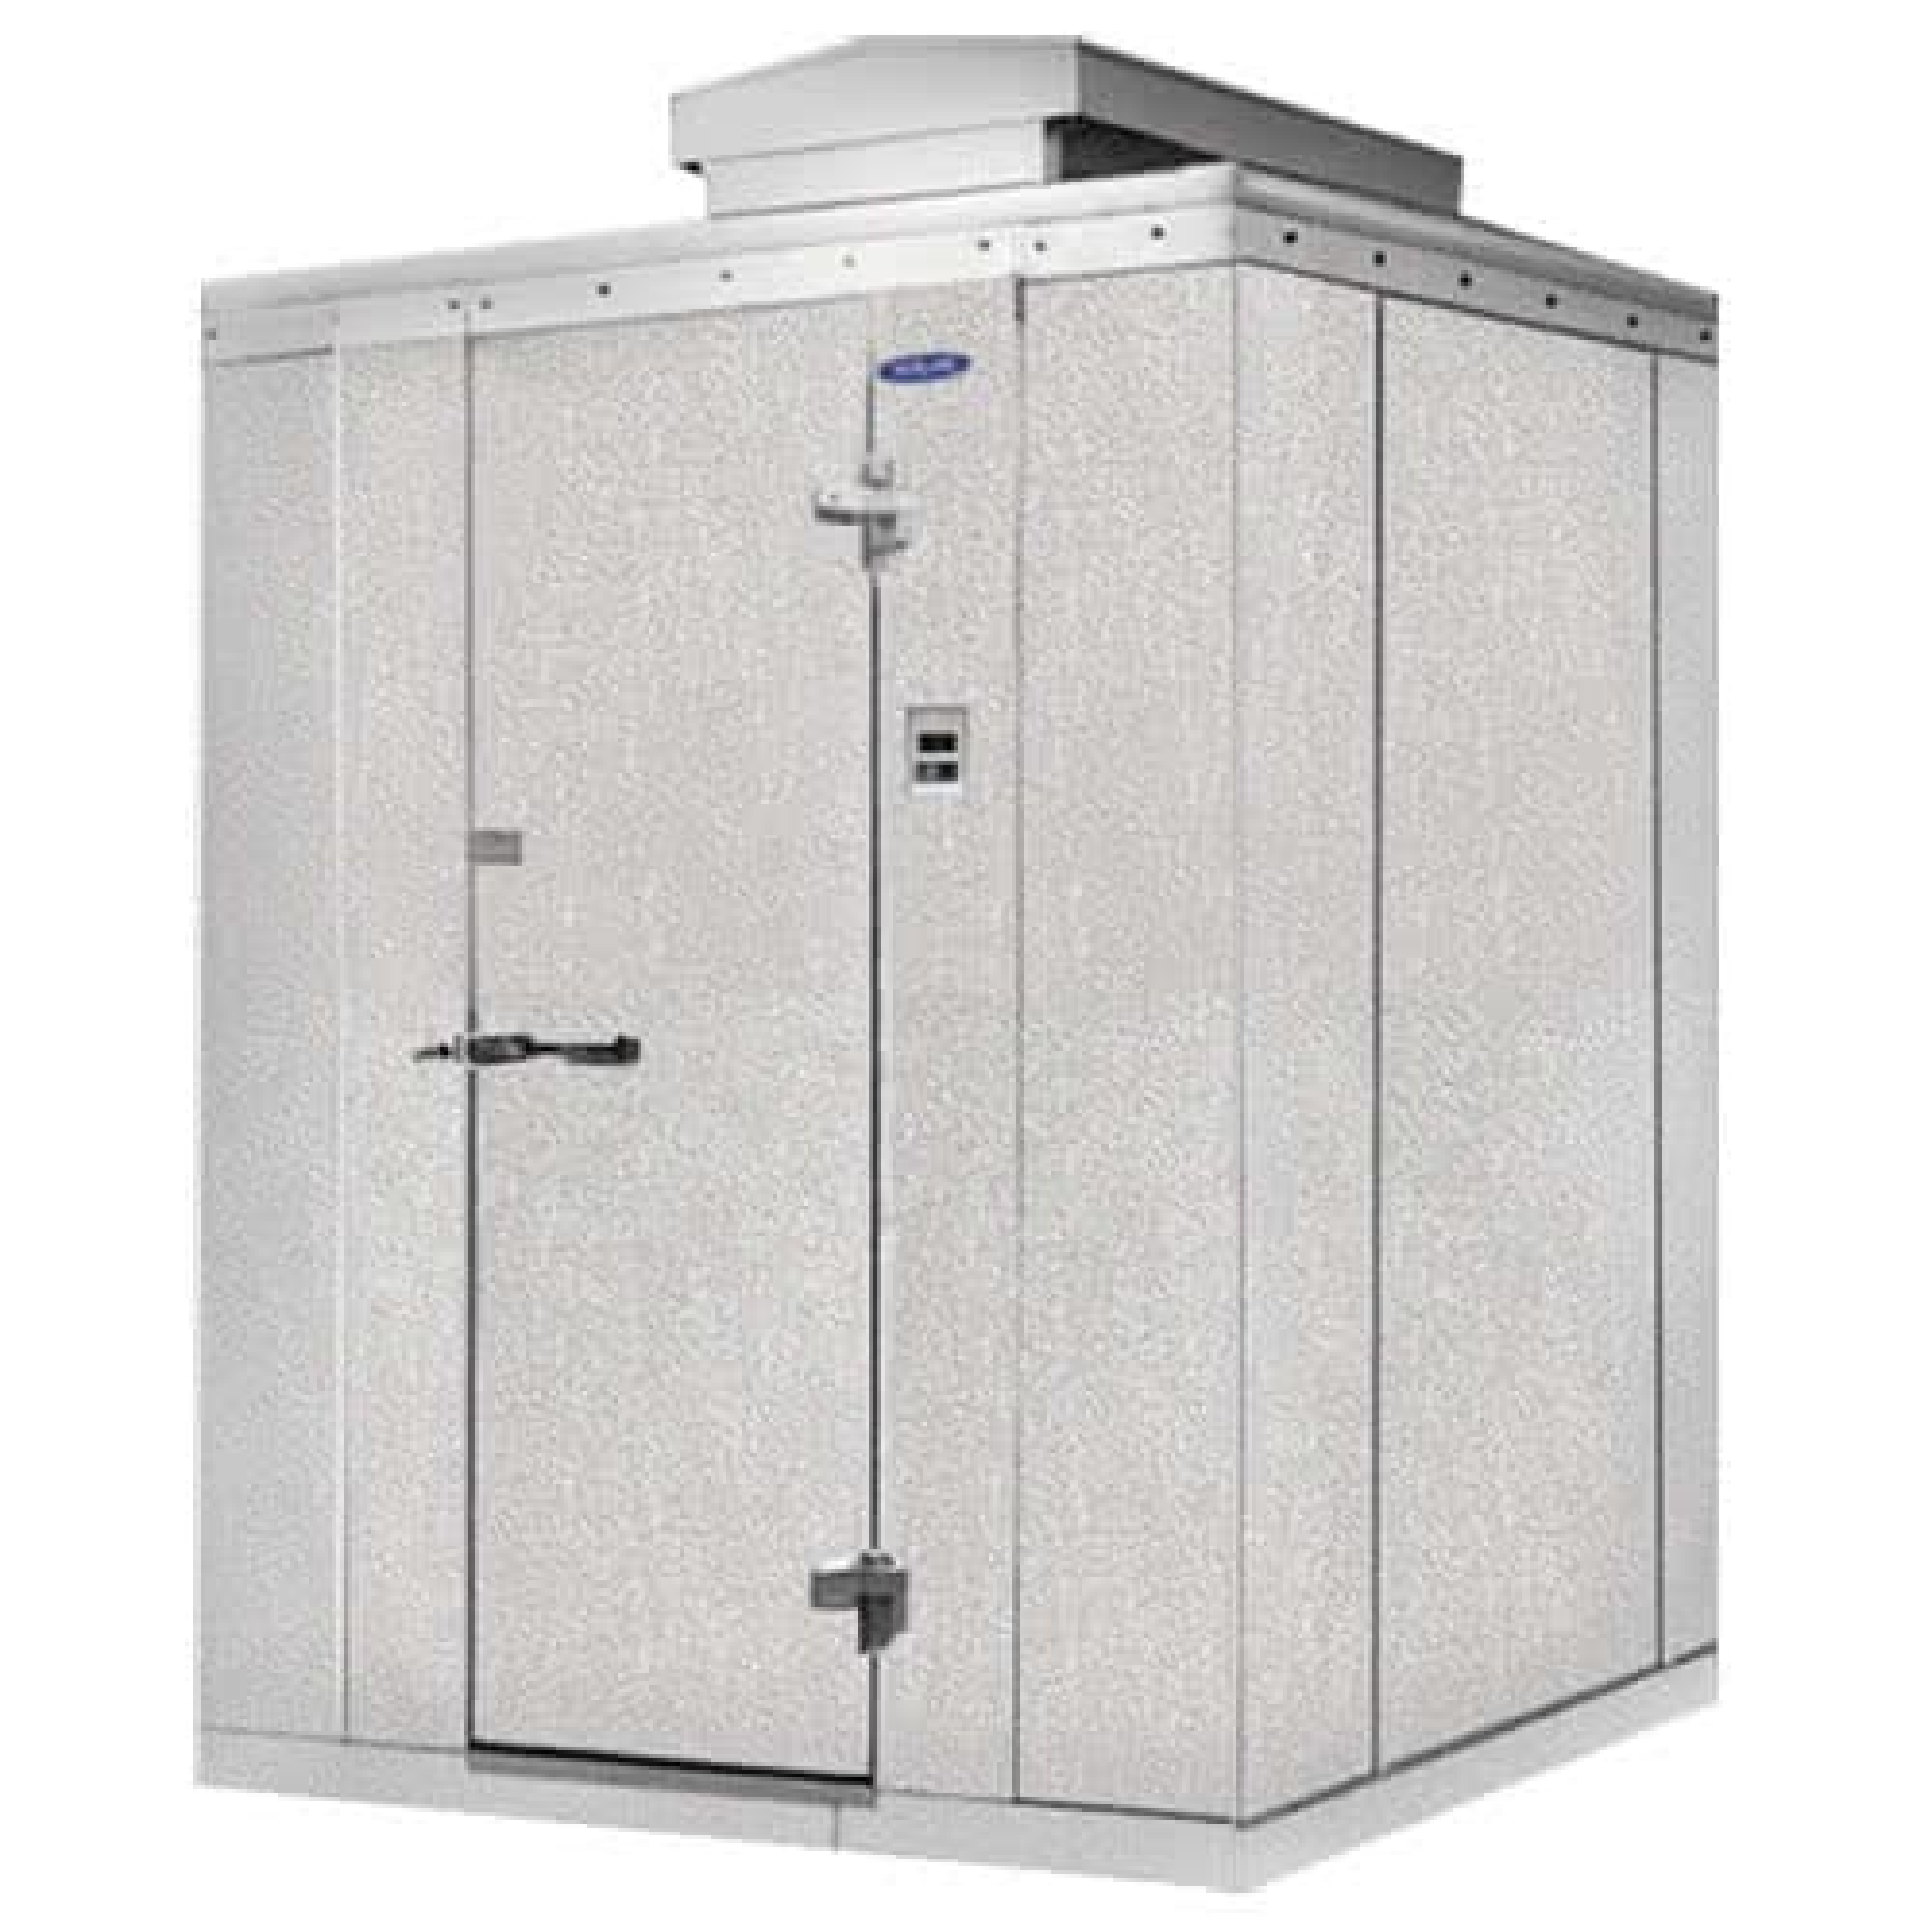 Norlake KODB77814-C Outdoor Walk-In Refrigerator w/ Top Mount Compressor, 8' x 14'